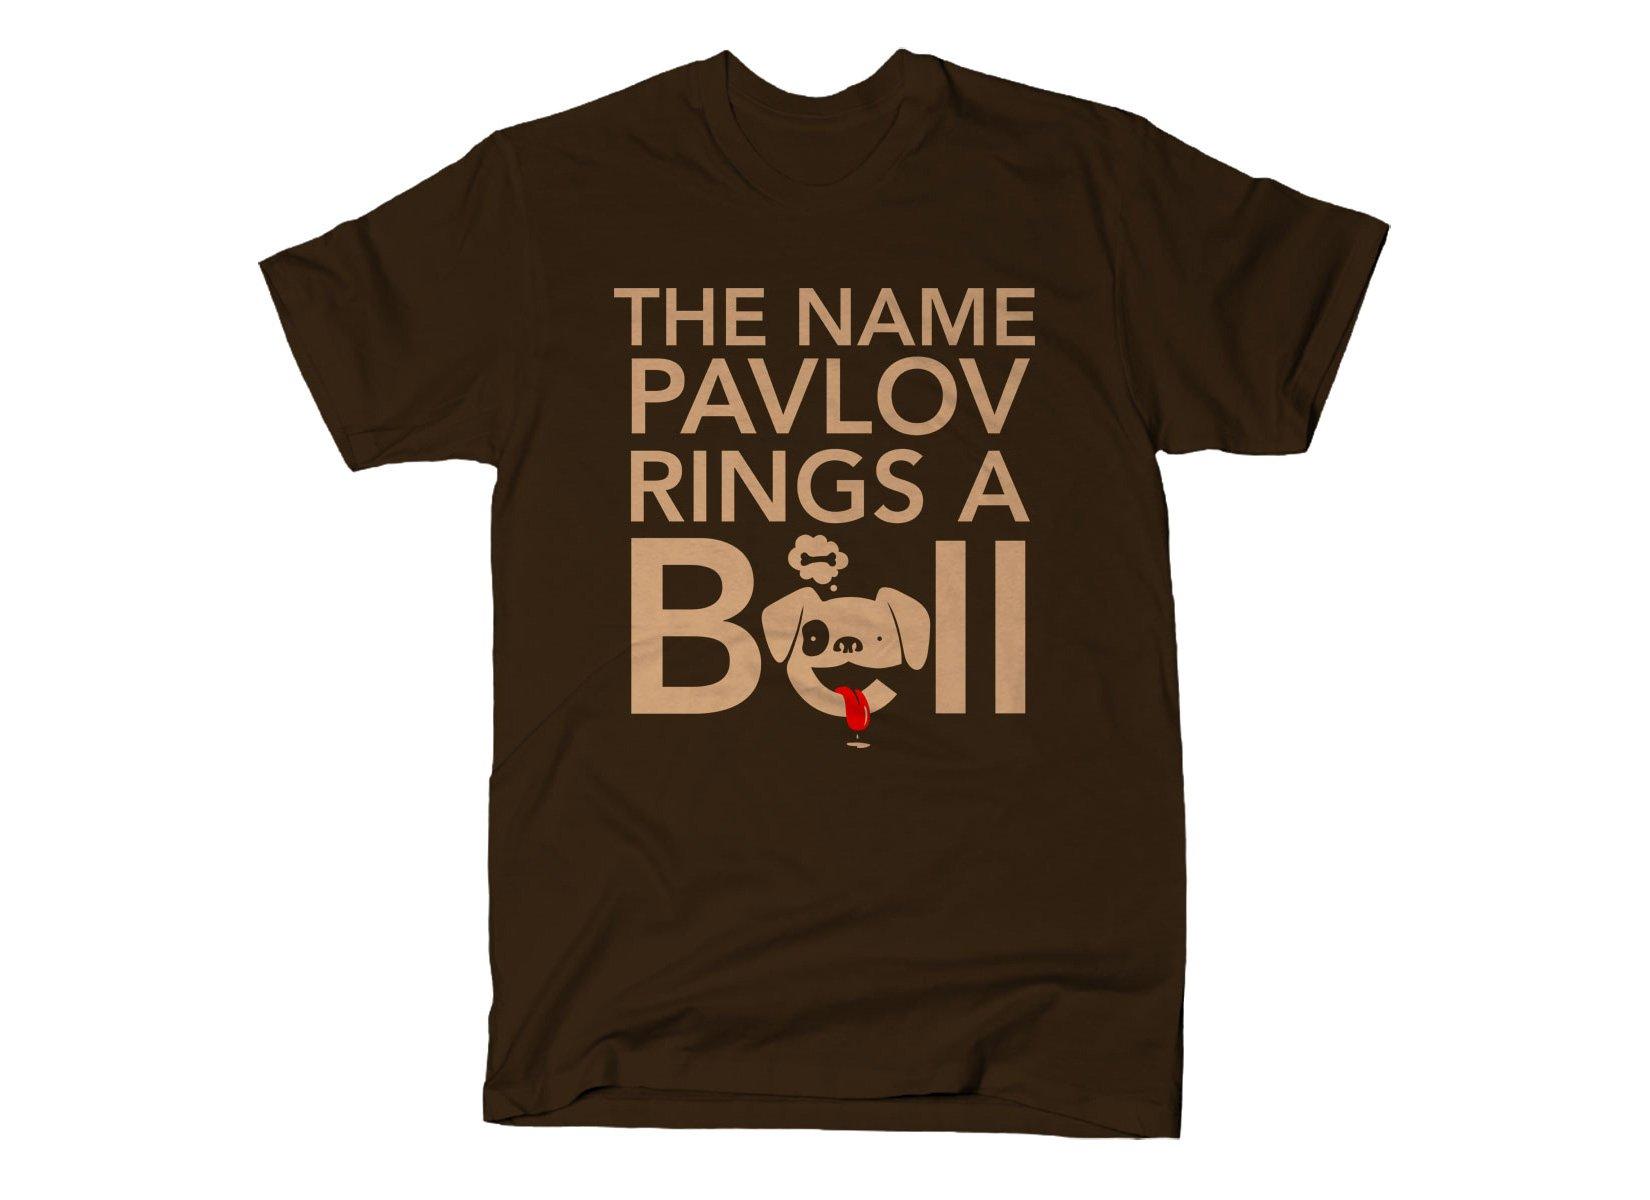 The Name Pavlov Rings A Bell on Mens T-Shirt